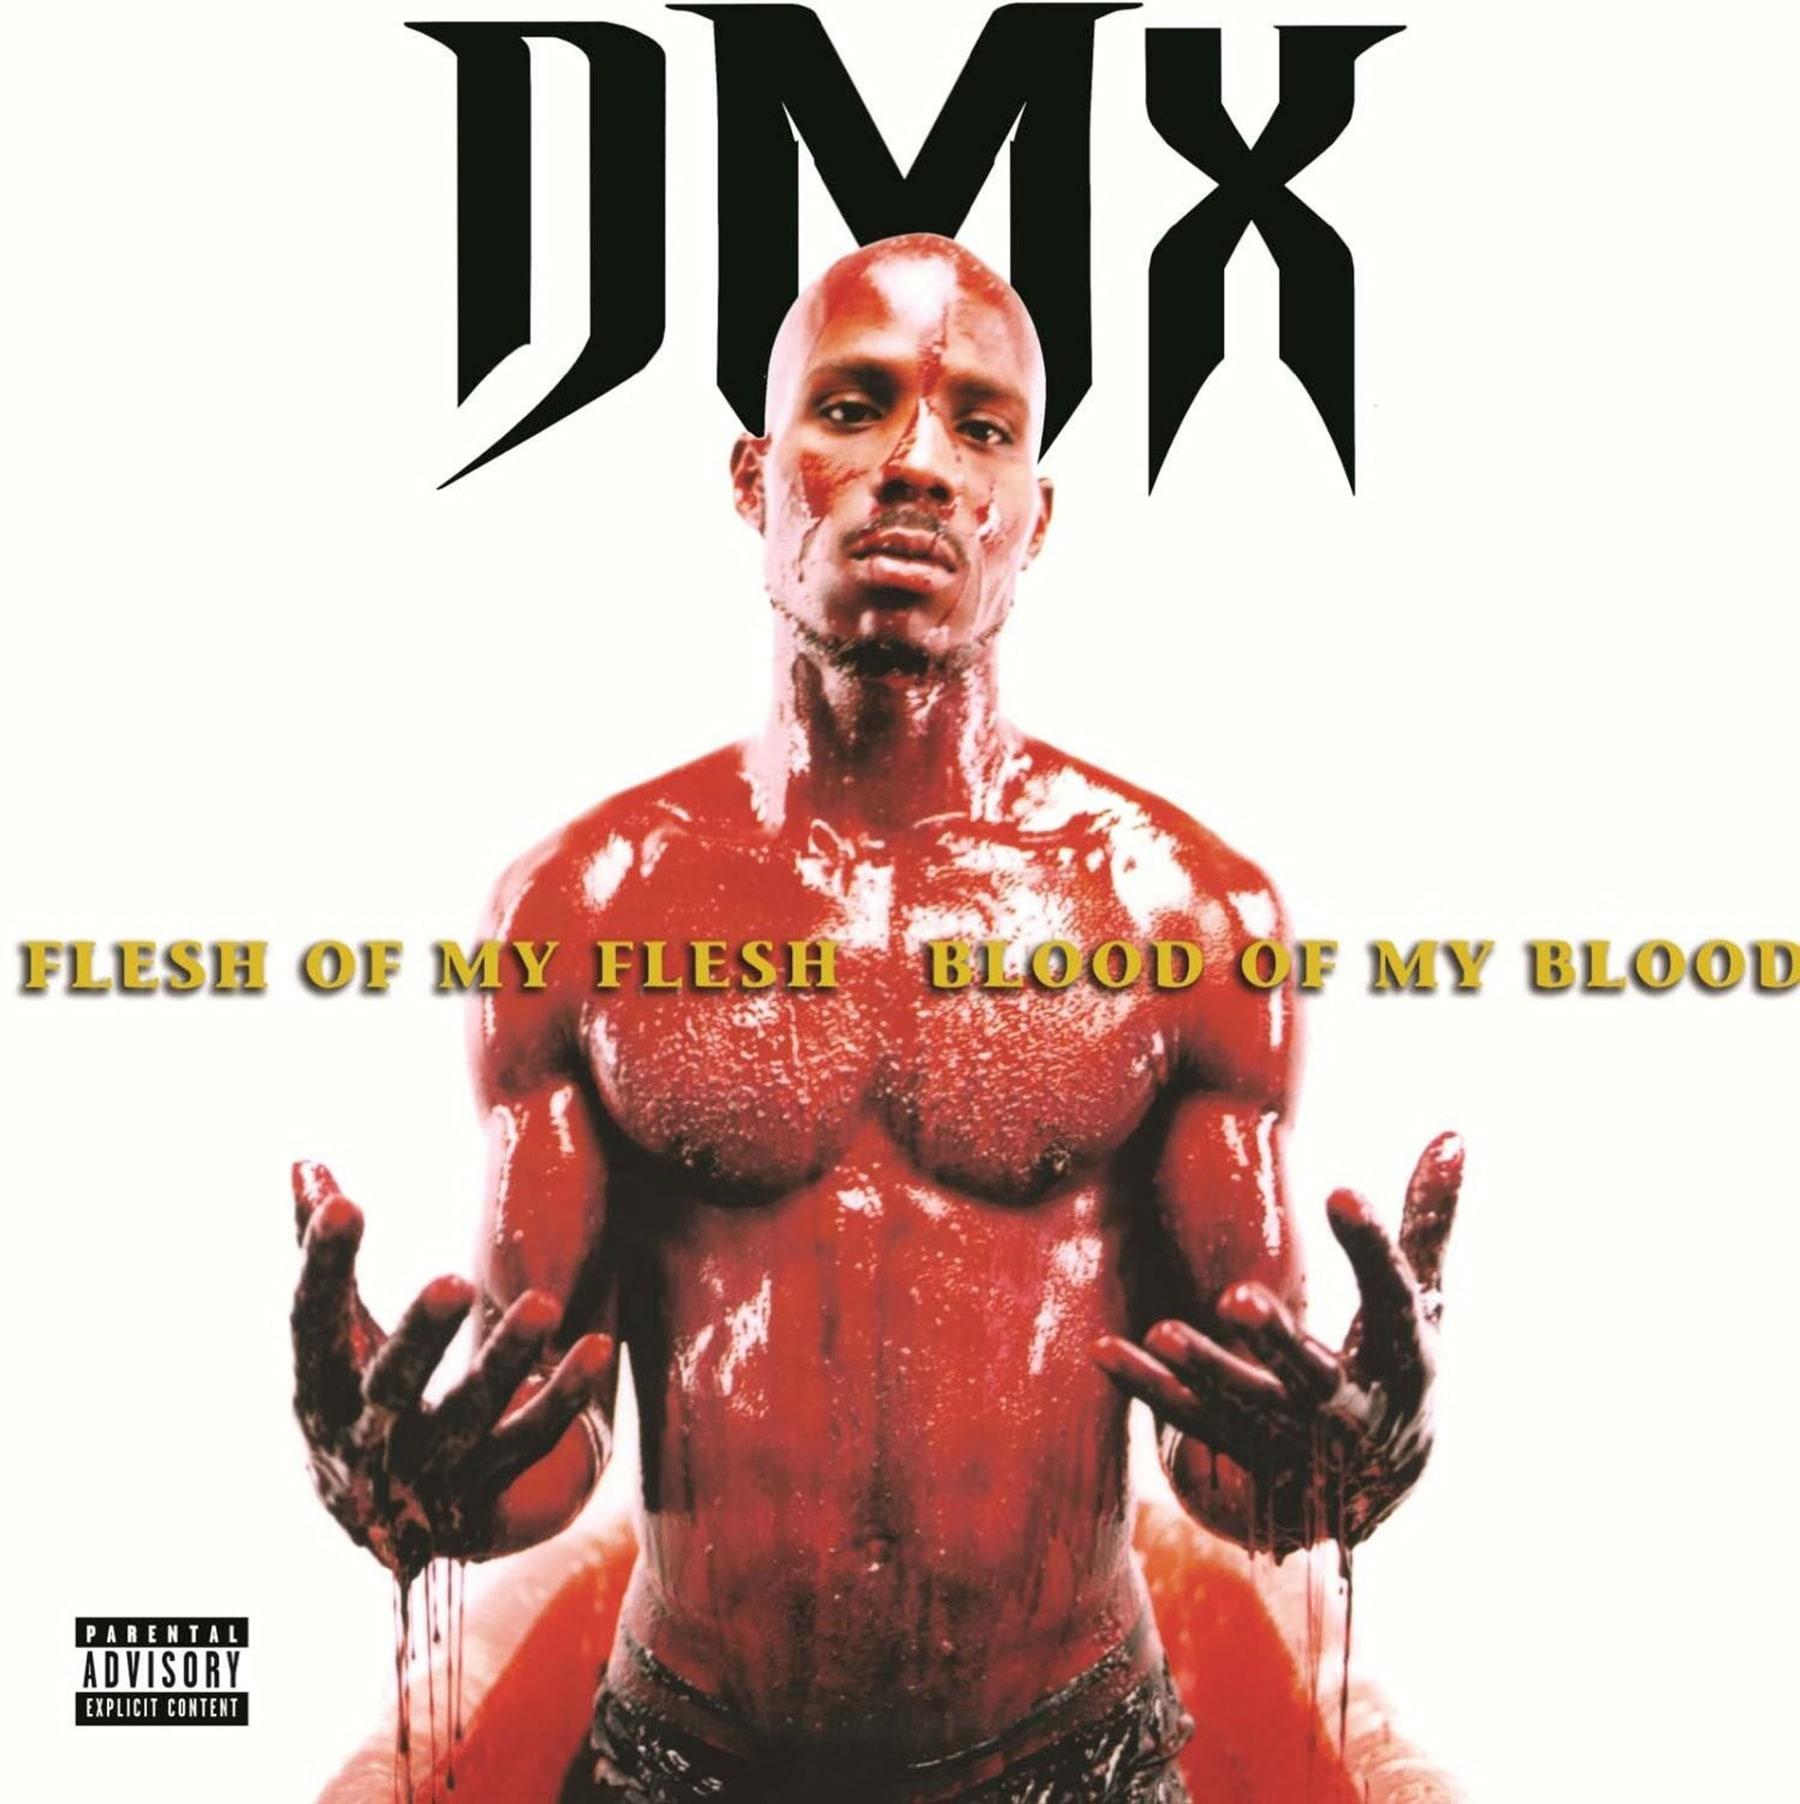 dmx-flesh-of-my-flesh-oral-history-ruff-ryders